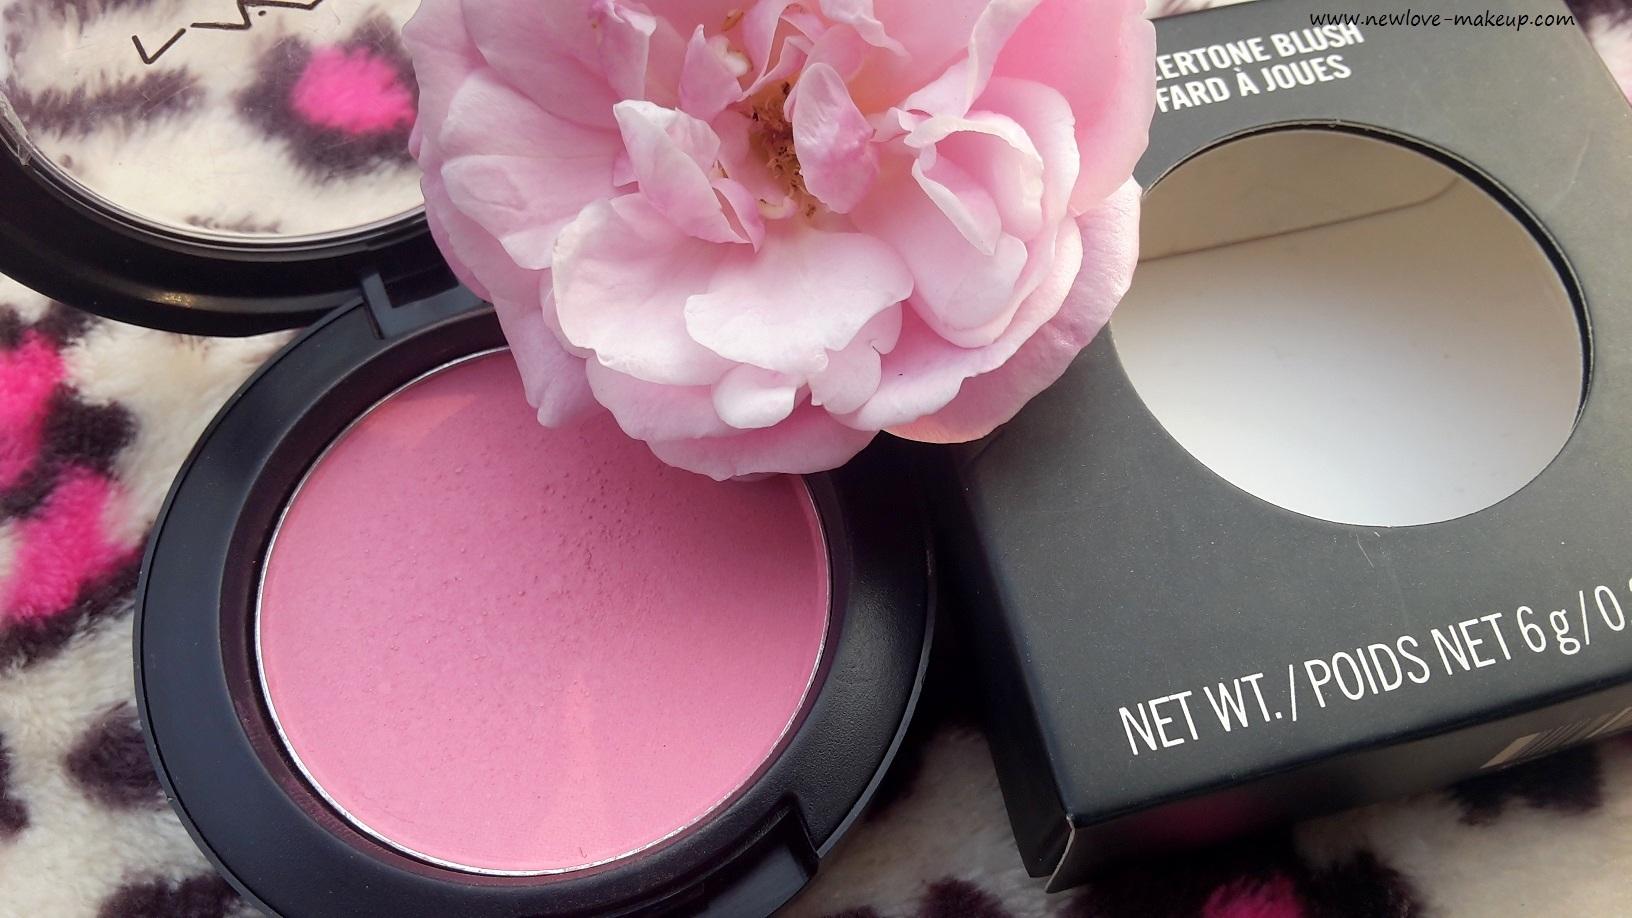 mac pink swoon blush swatch